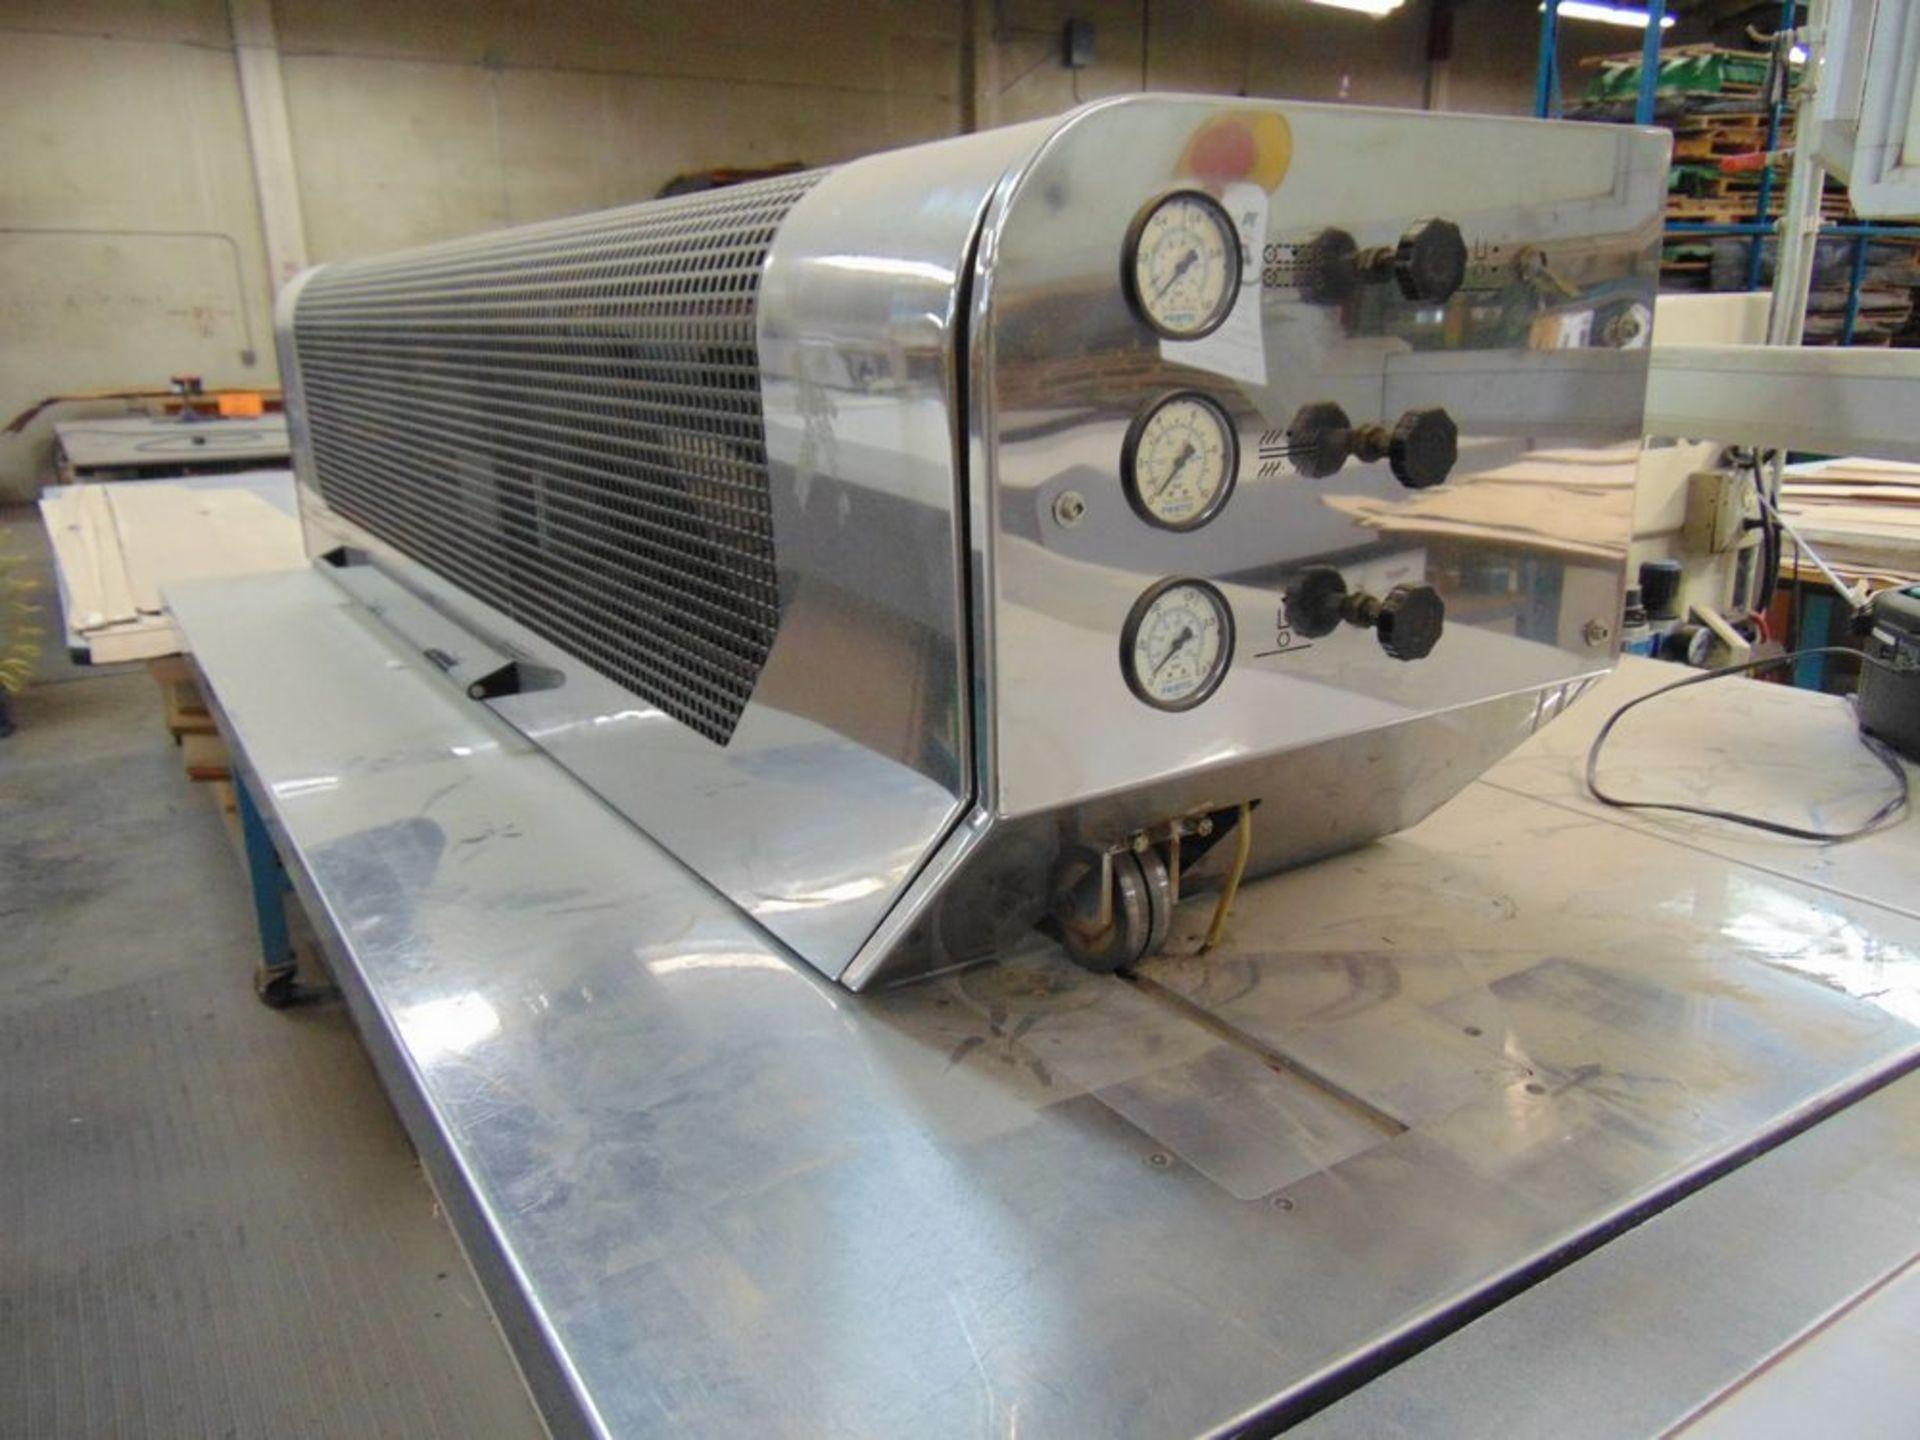 (1999) Kuper Type FCI Mach. No. 3908/0113 Veneer Splicing Machine w/ 54'' x 102''L Light Table; S/ - Image 2 of 7